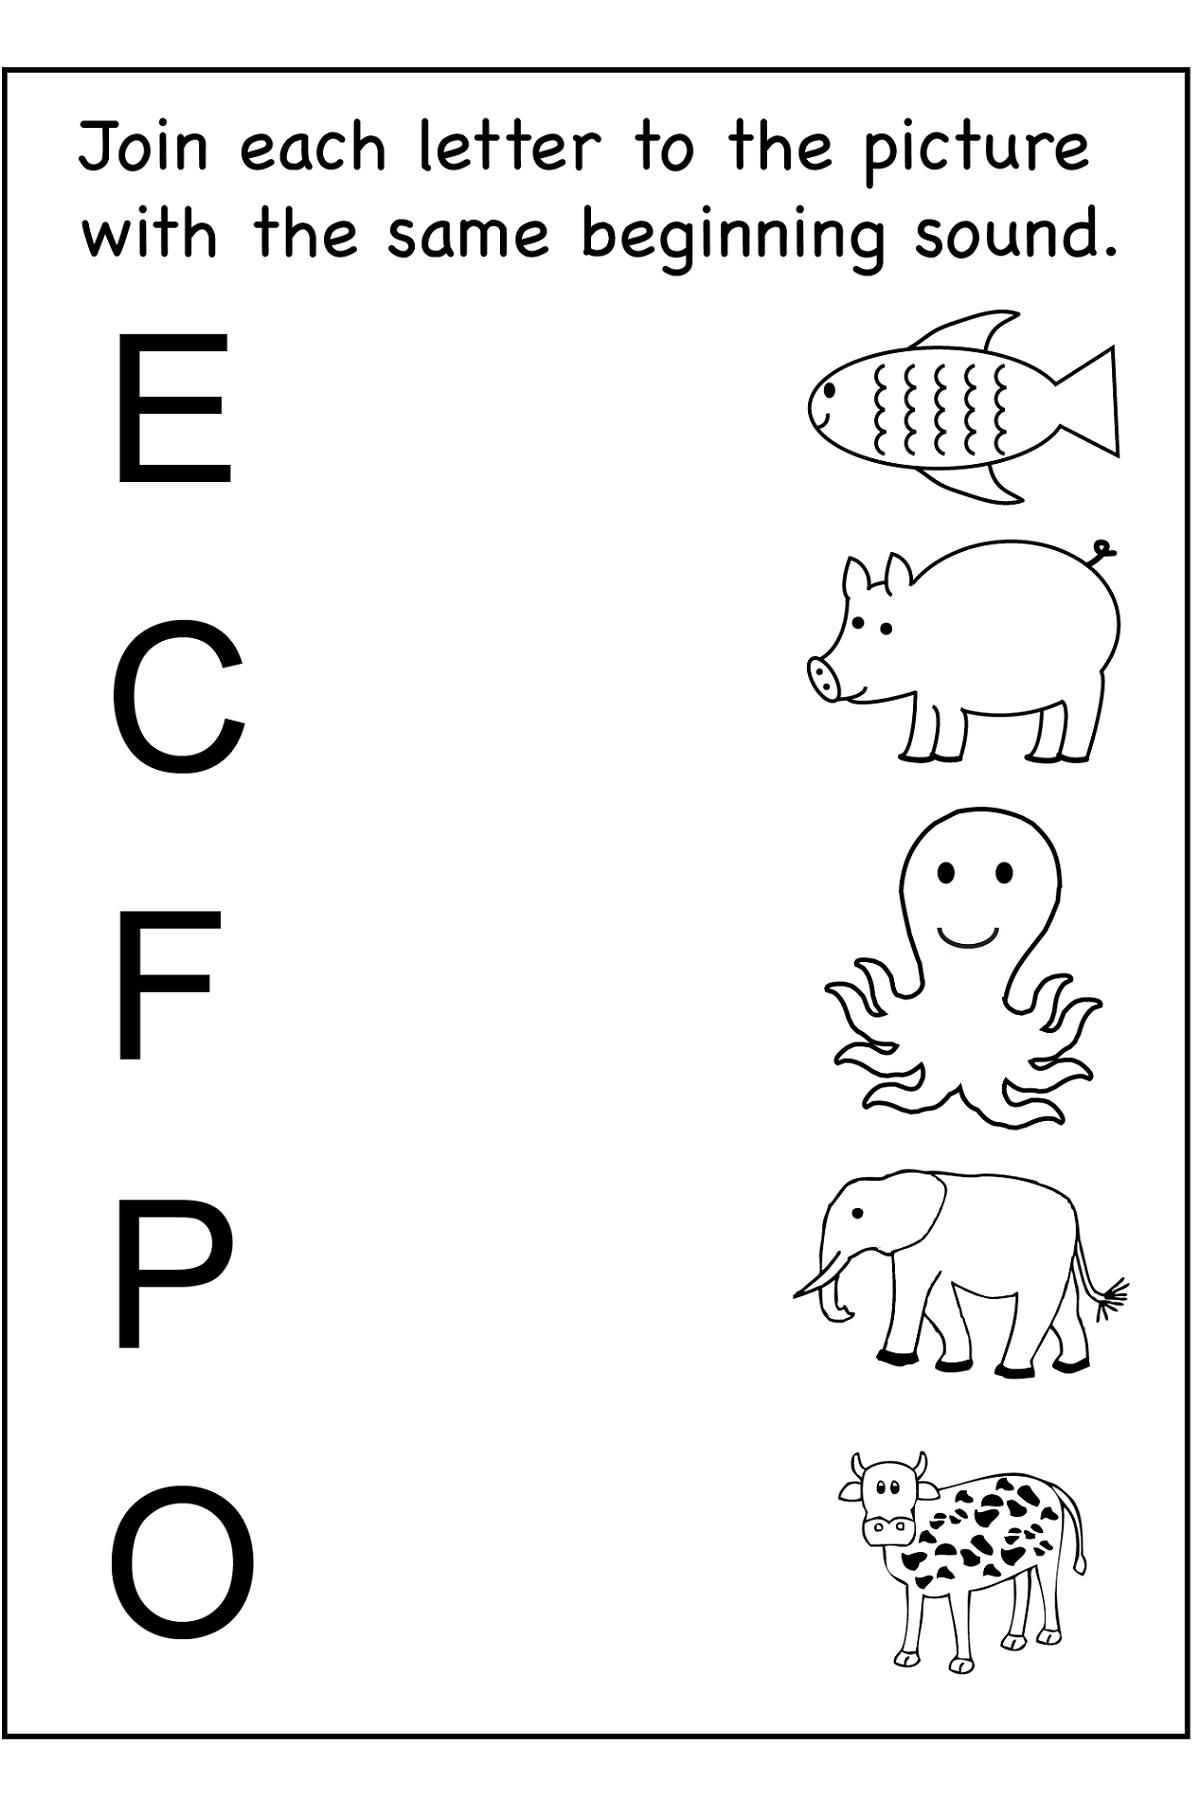 Free Fun Worksheets For Kids